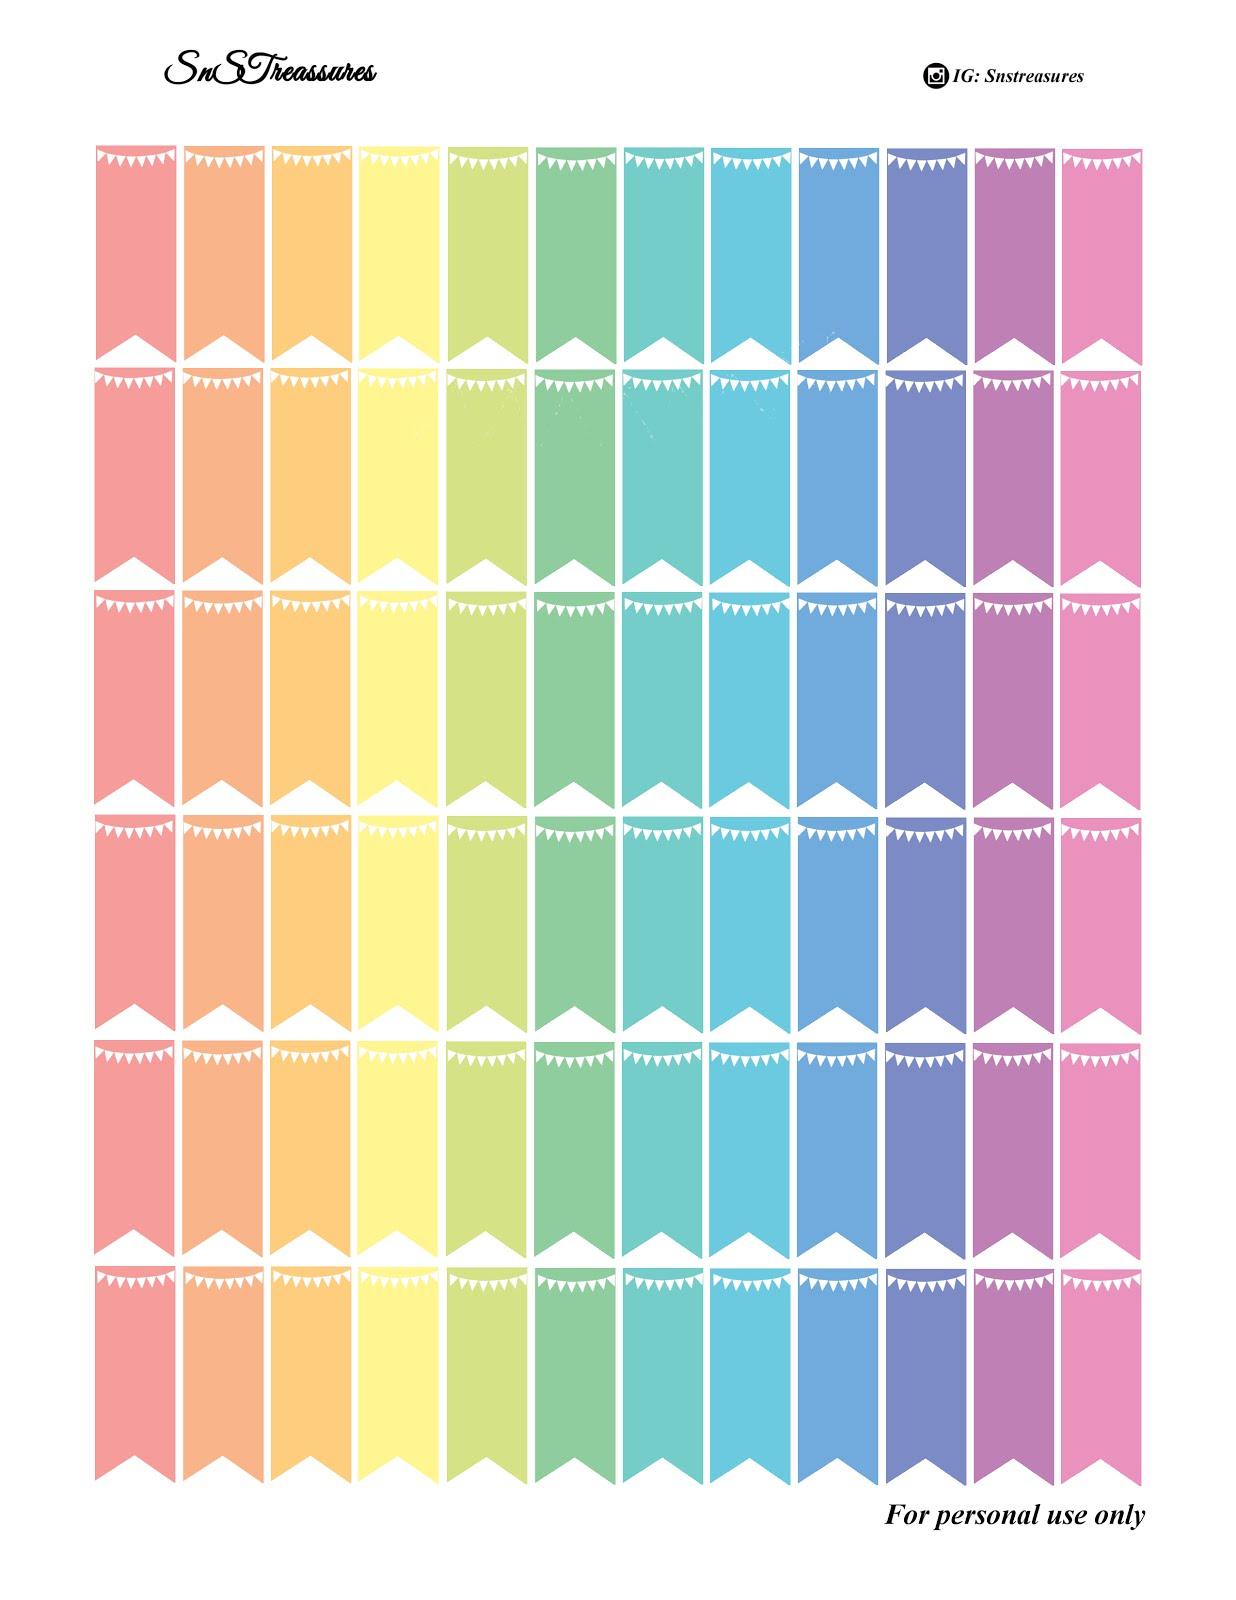 Rainbow Page Flag Freebie Snstreasures